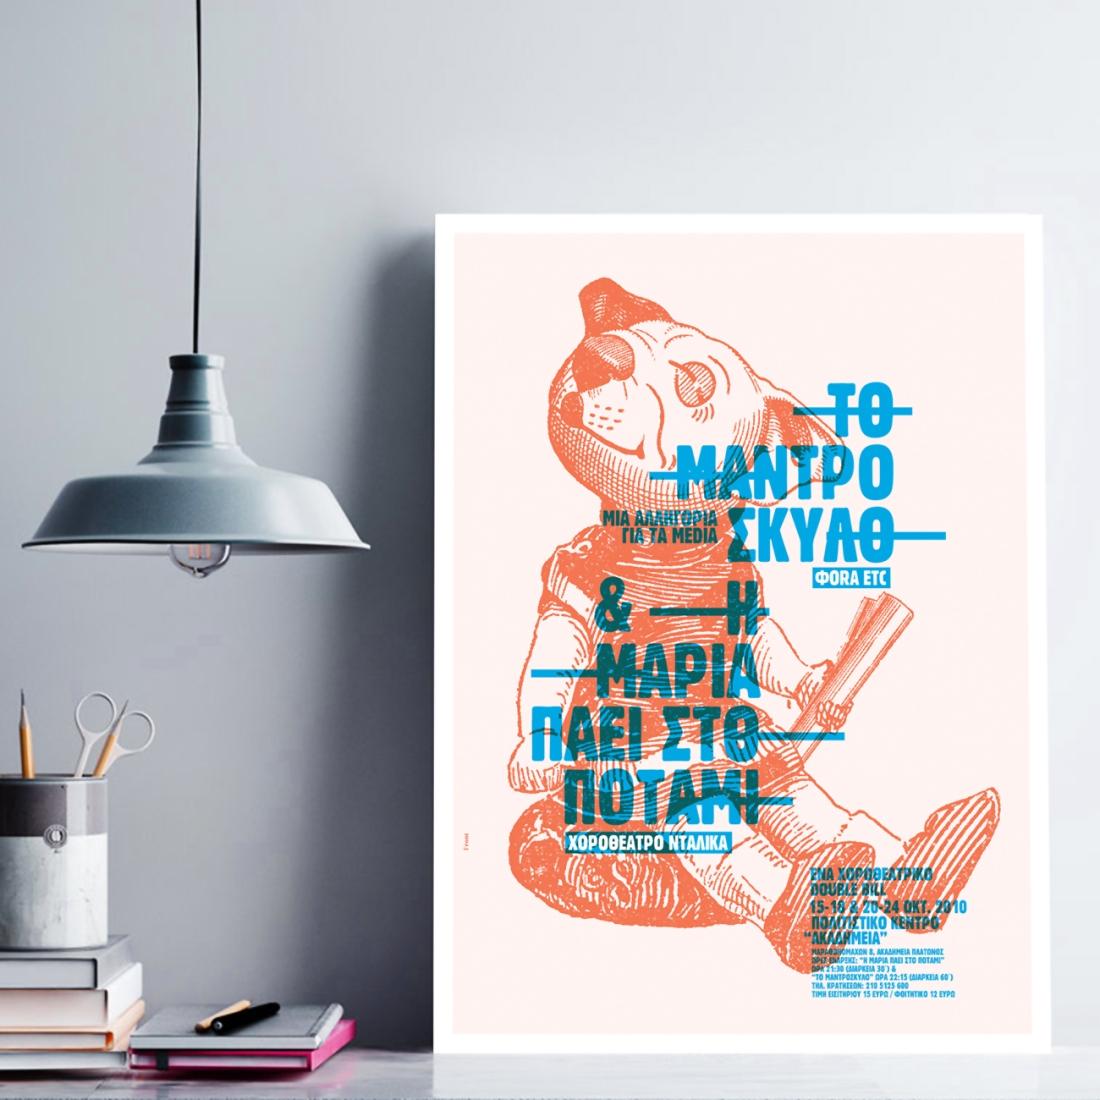 madro_insta